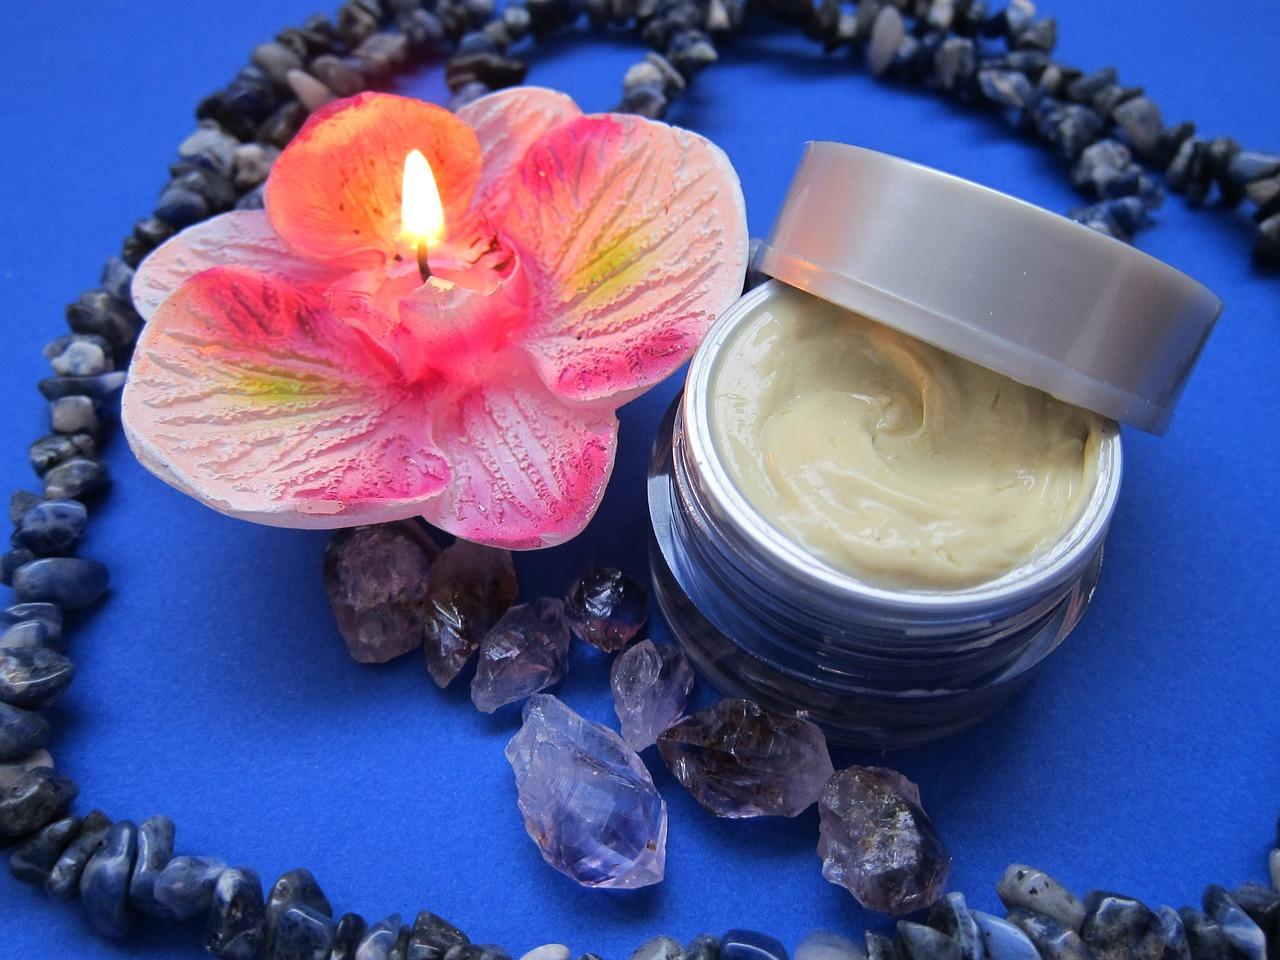 3 Benefits of Anti-aging Wrinkle Creams